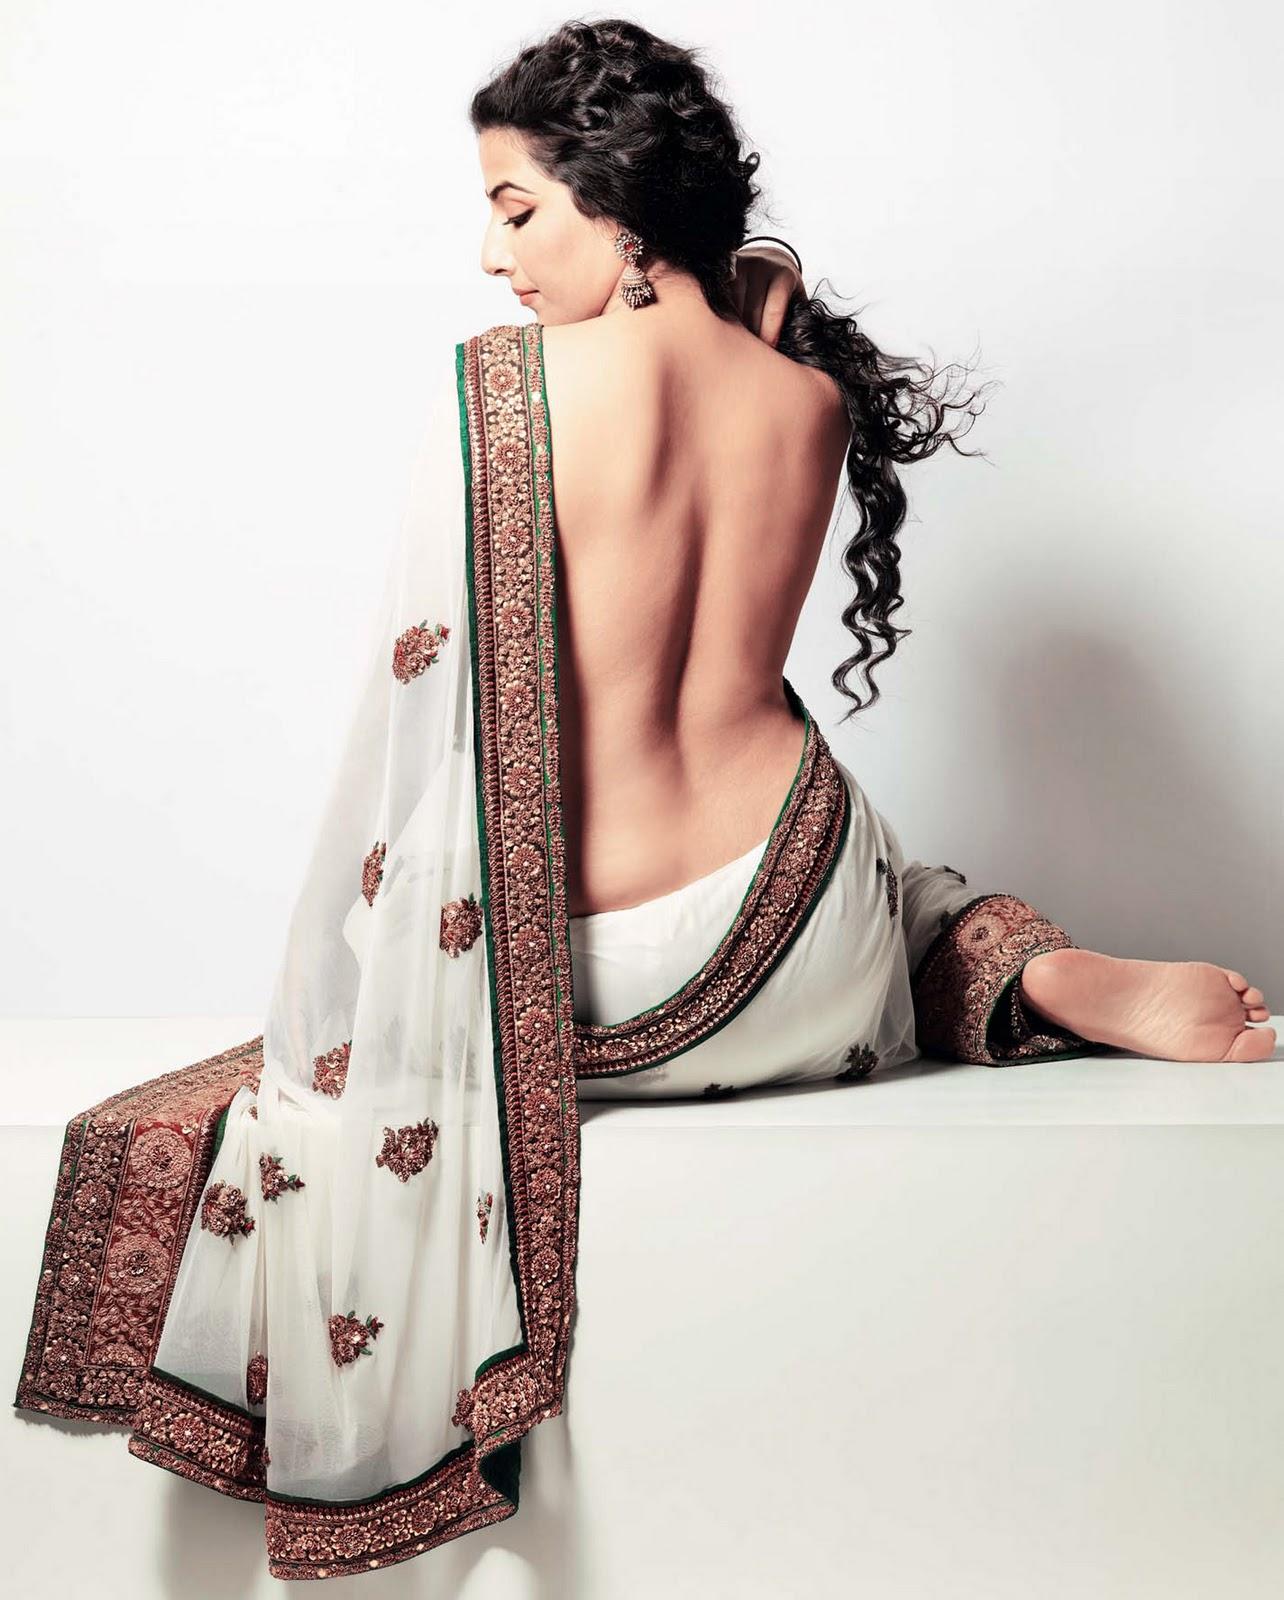 Sexy ass ladies in saree, karala school girl sex